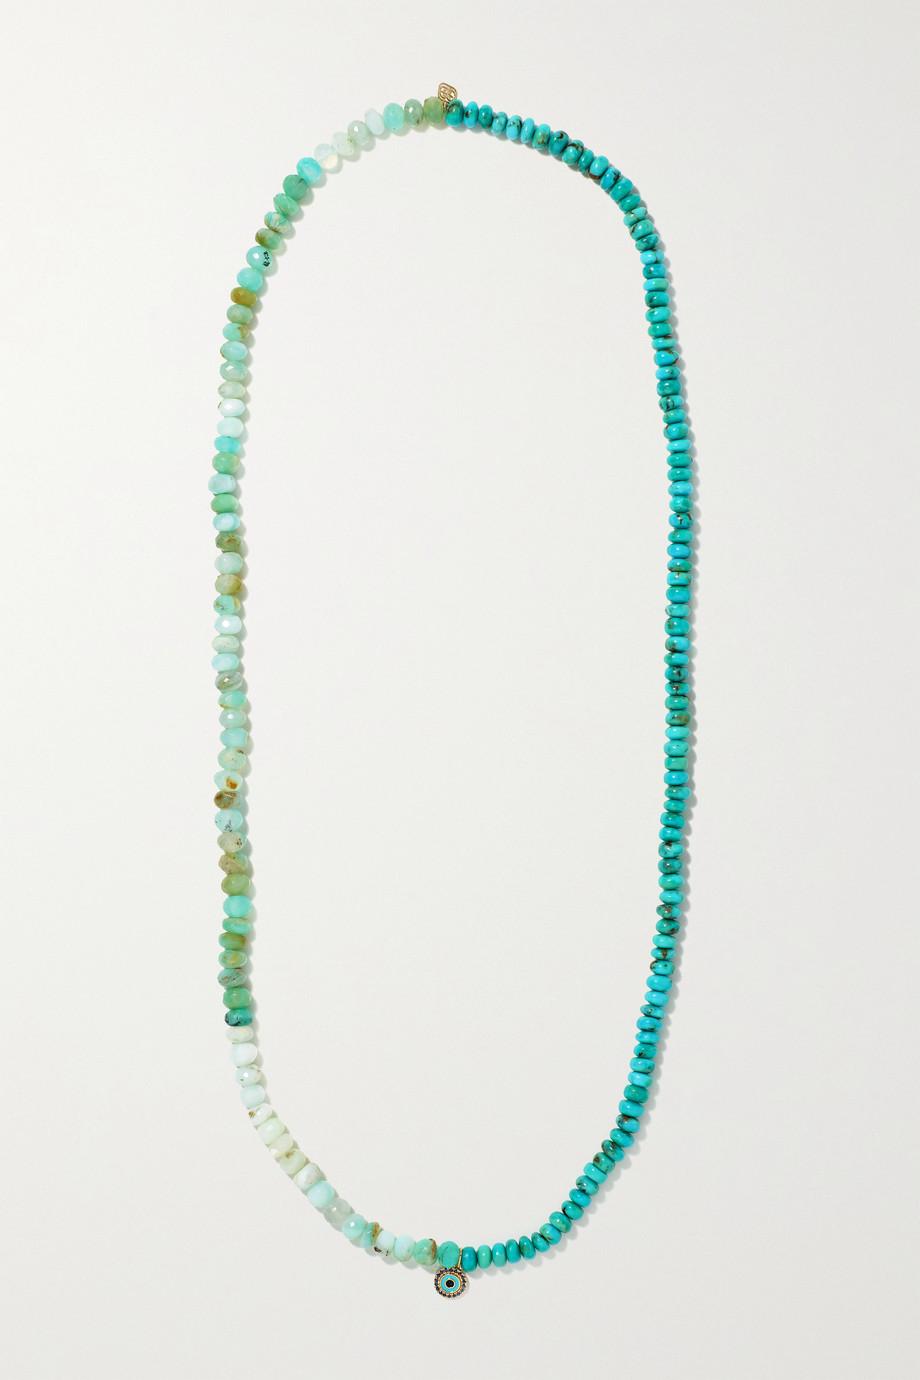 Sydney Evan Evil Eye 14-karat gold multi-stone necklace